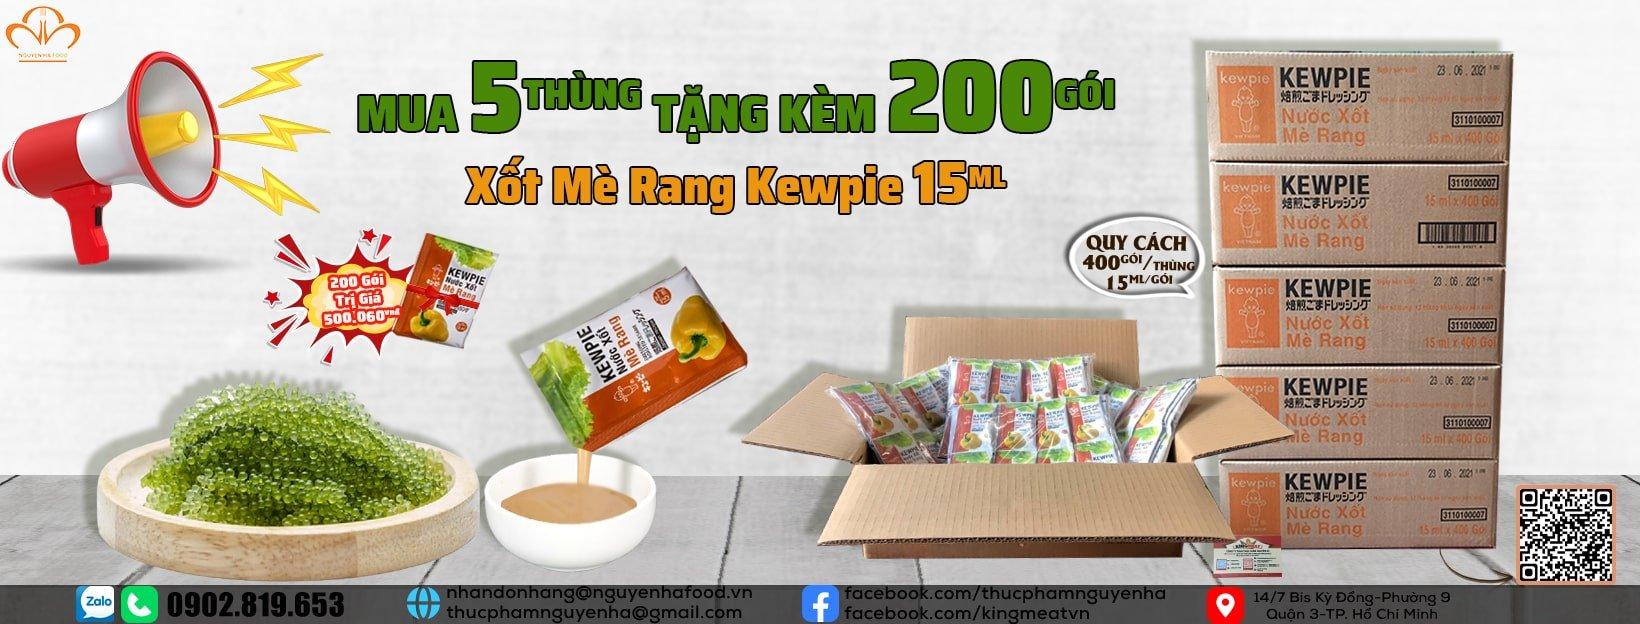 khuyen-mai-nuoc-xot-me-rang-kewpie-goi-15ml